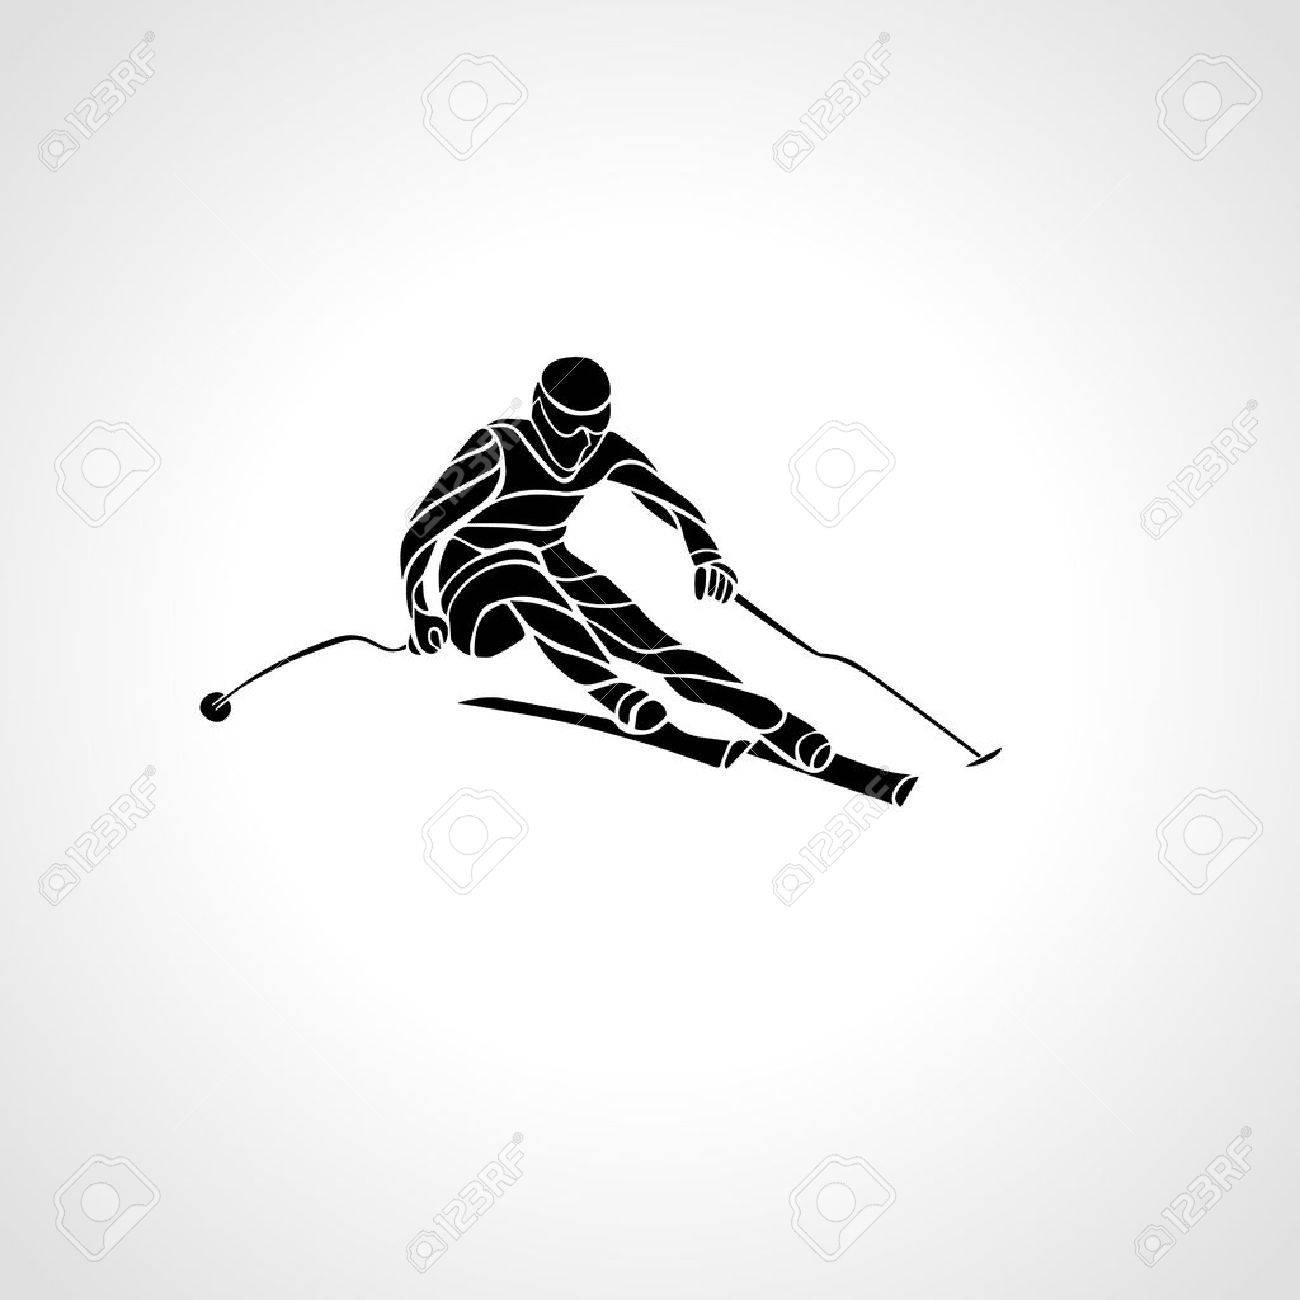 Ski downhill. Creative silhouette of the skier. Giant Slalom Ski Racer. Vector illustration - 48354689